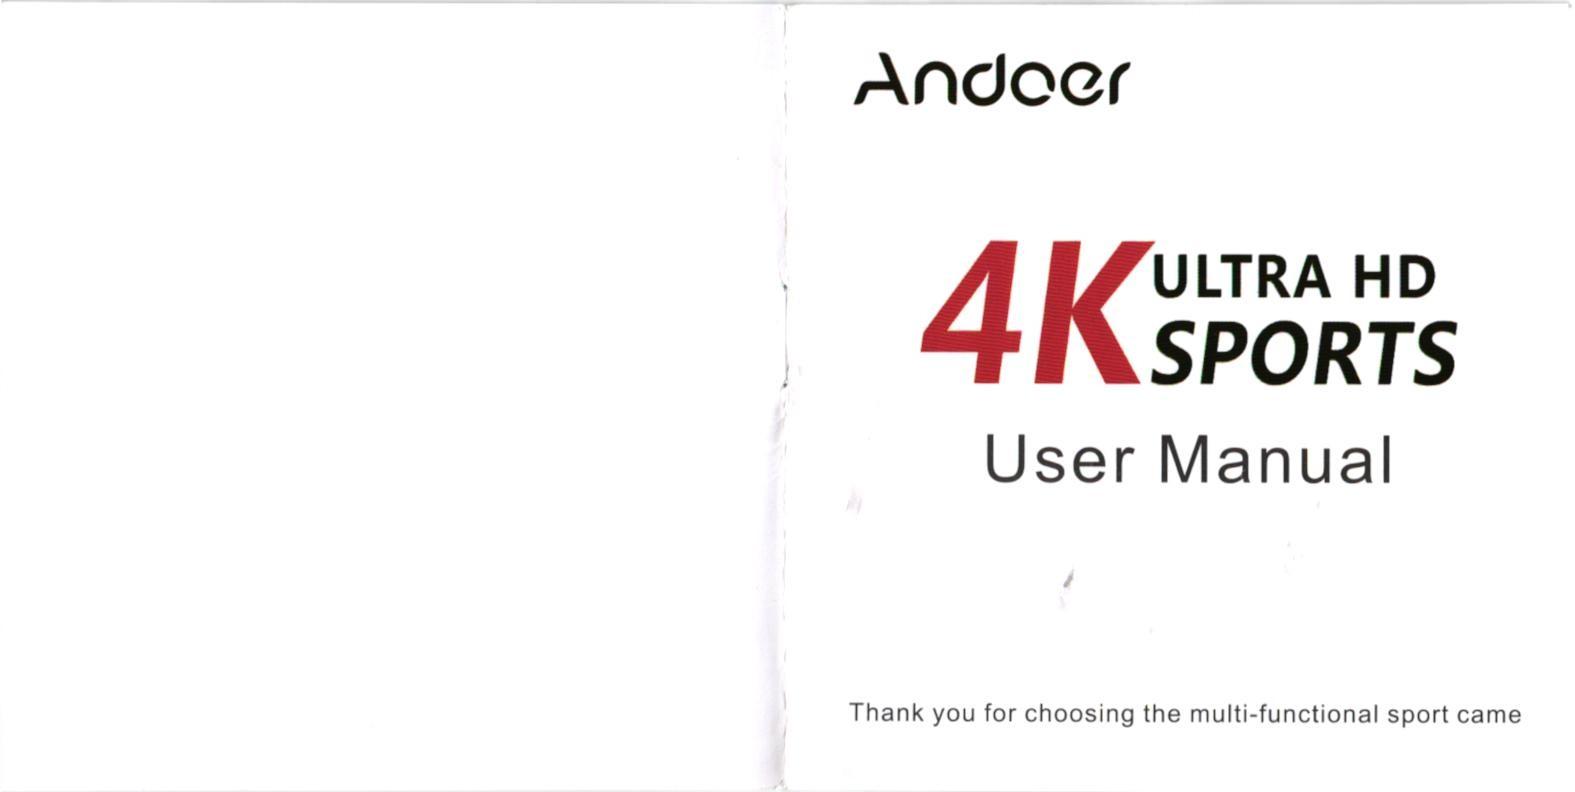 Andoer 4K Ultra HD sports camra 1